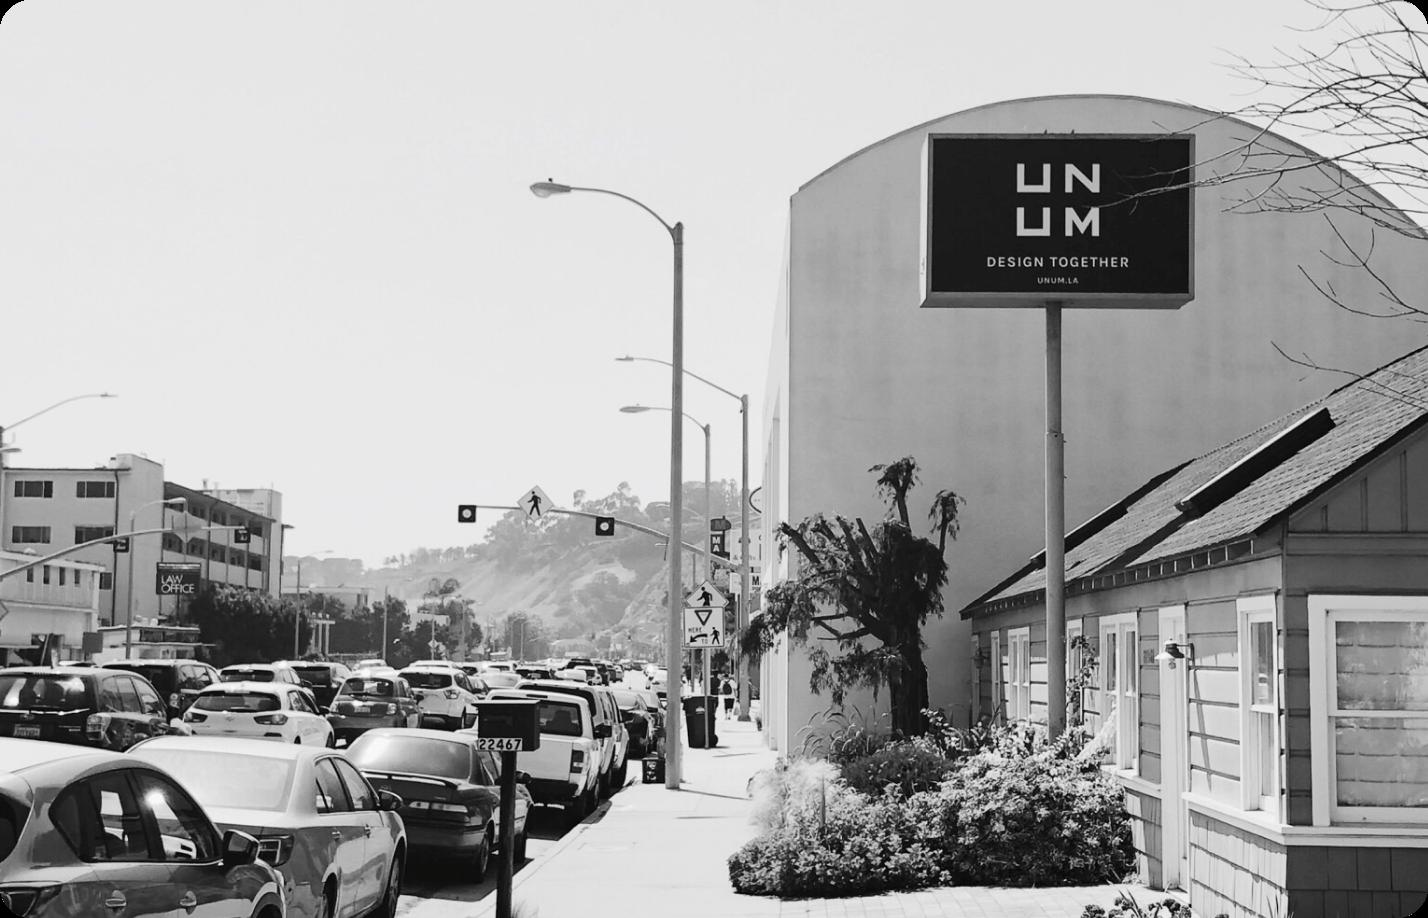 Unum Design Together street